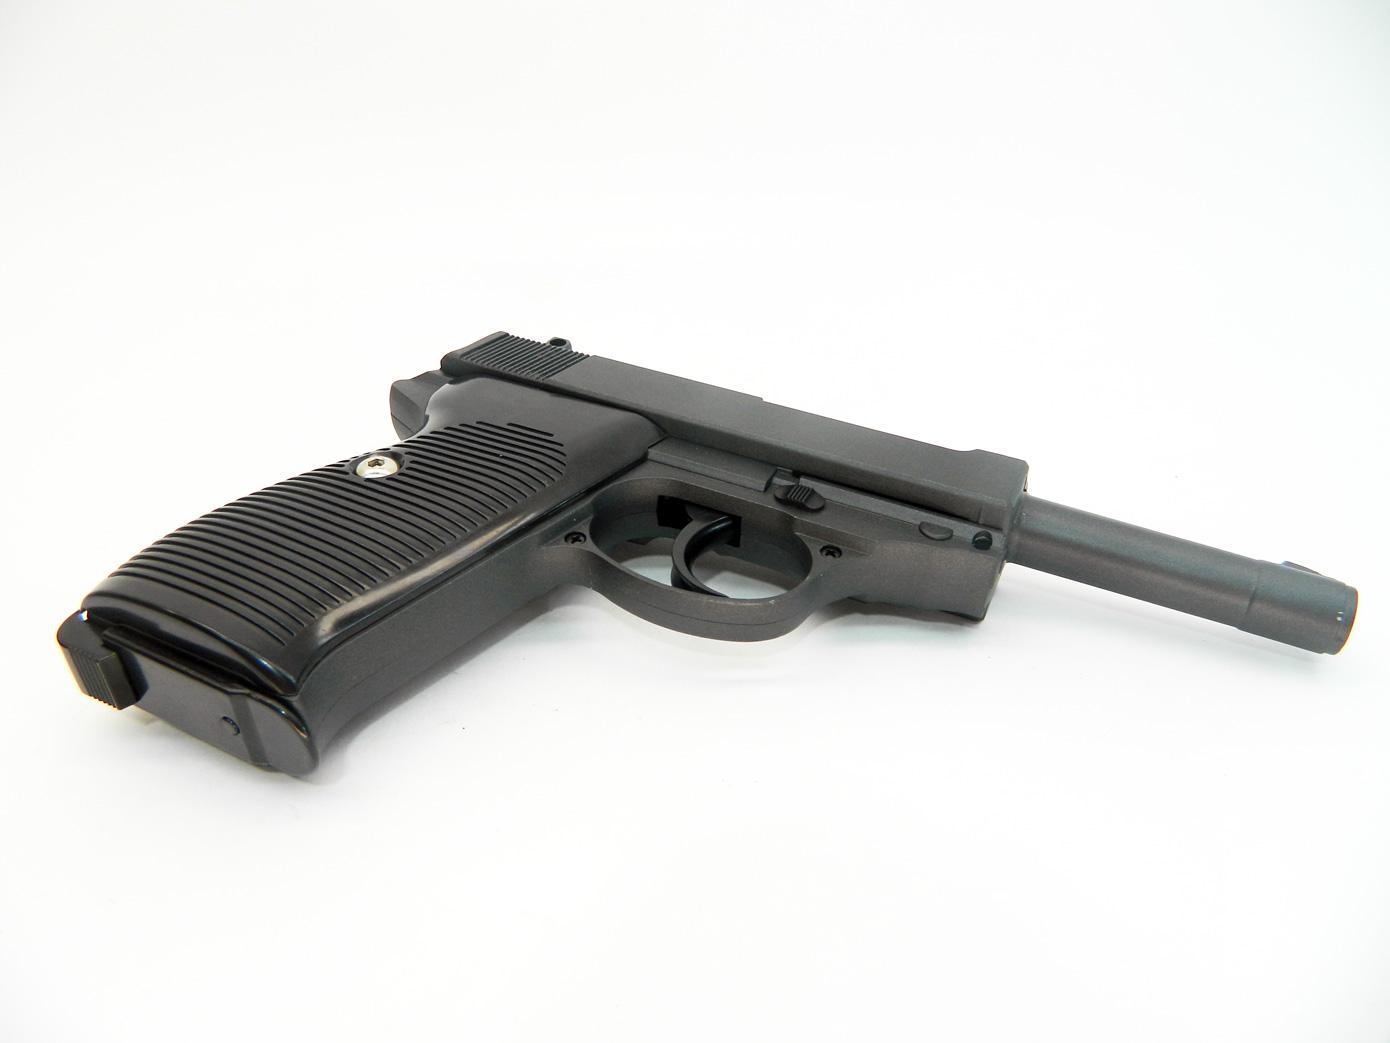 Walther P38 масштаб 1:1 изображение 3